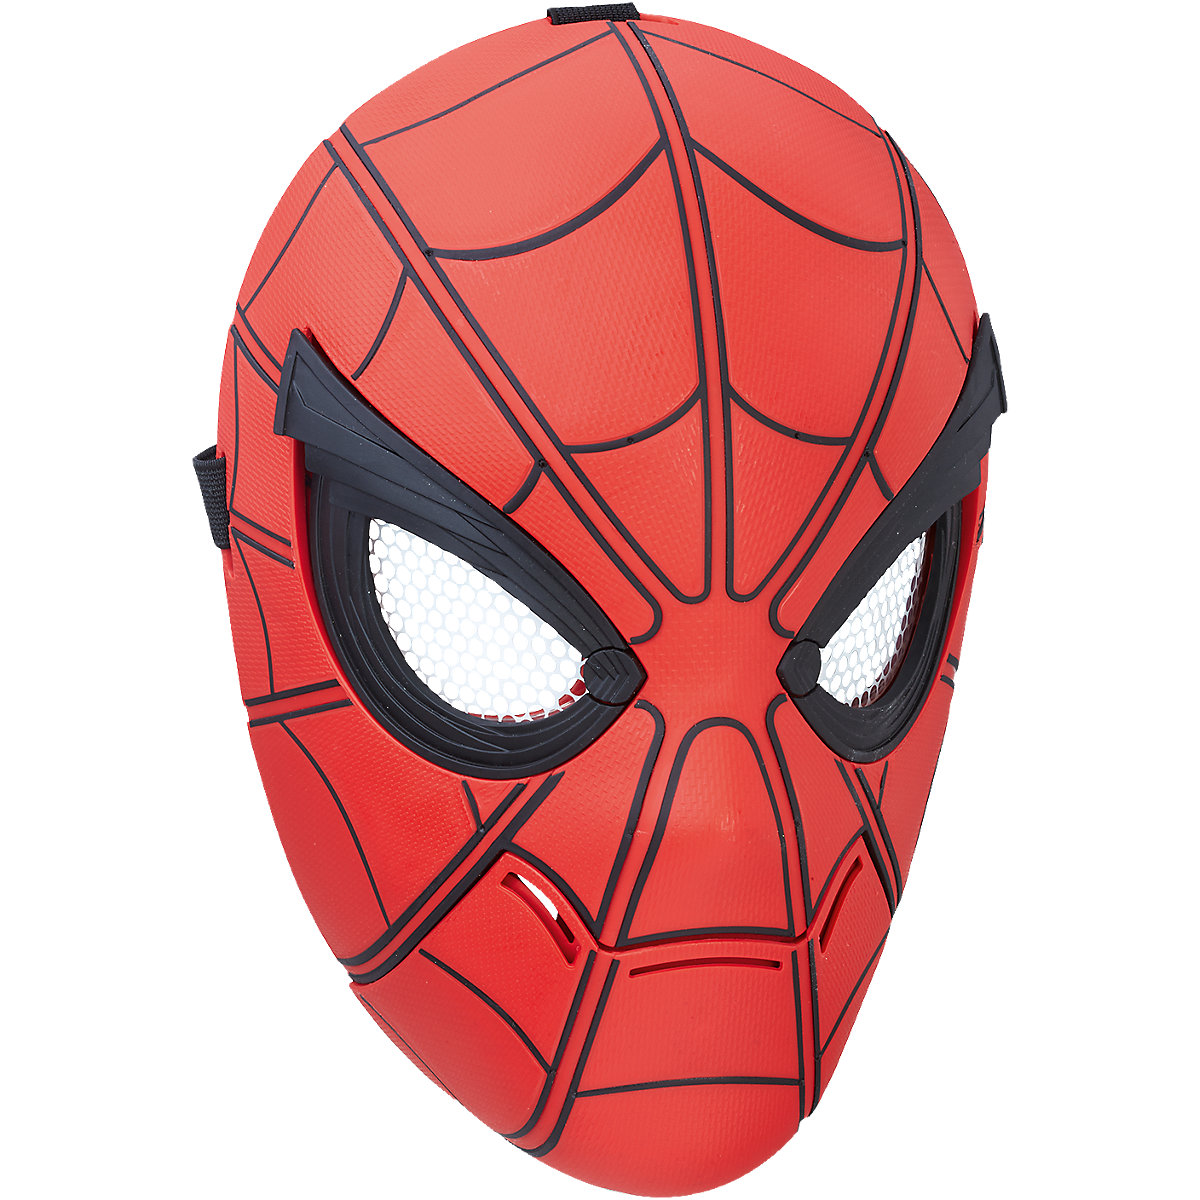 Hasbro Mask 5104323 Playsets Interactive Masks Aprilpromo Avengers Marvel Spider Man MTpromo